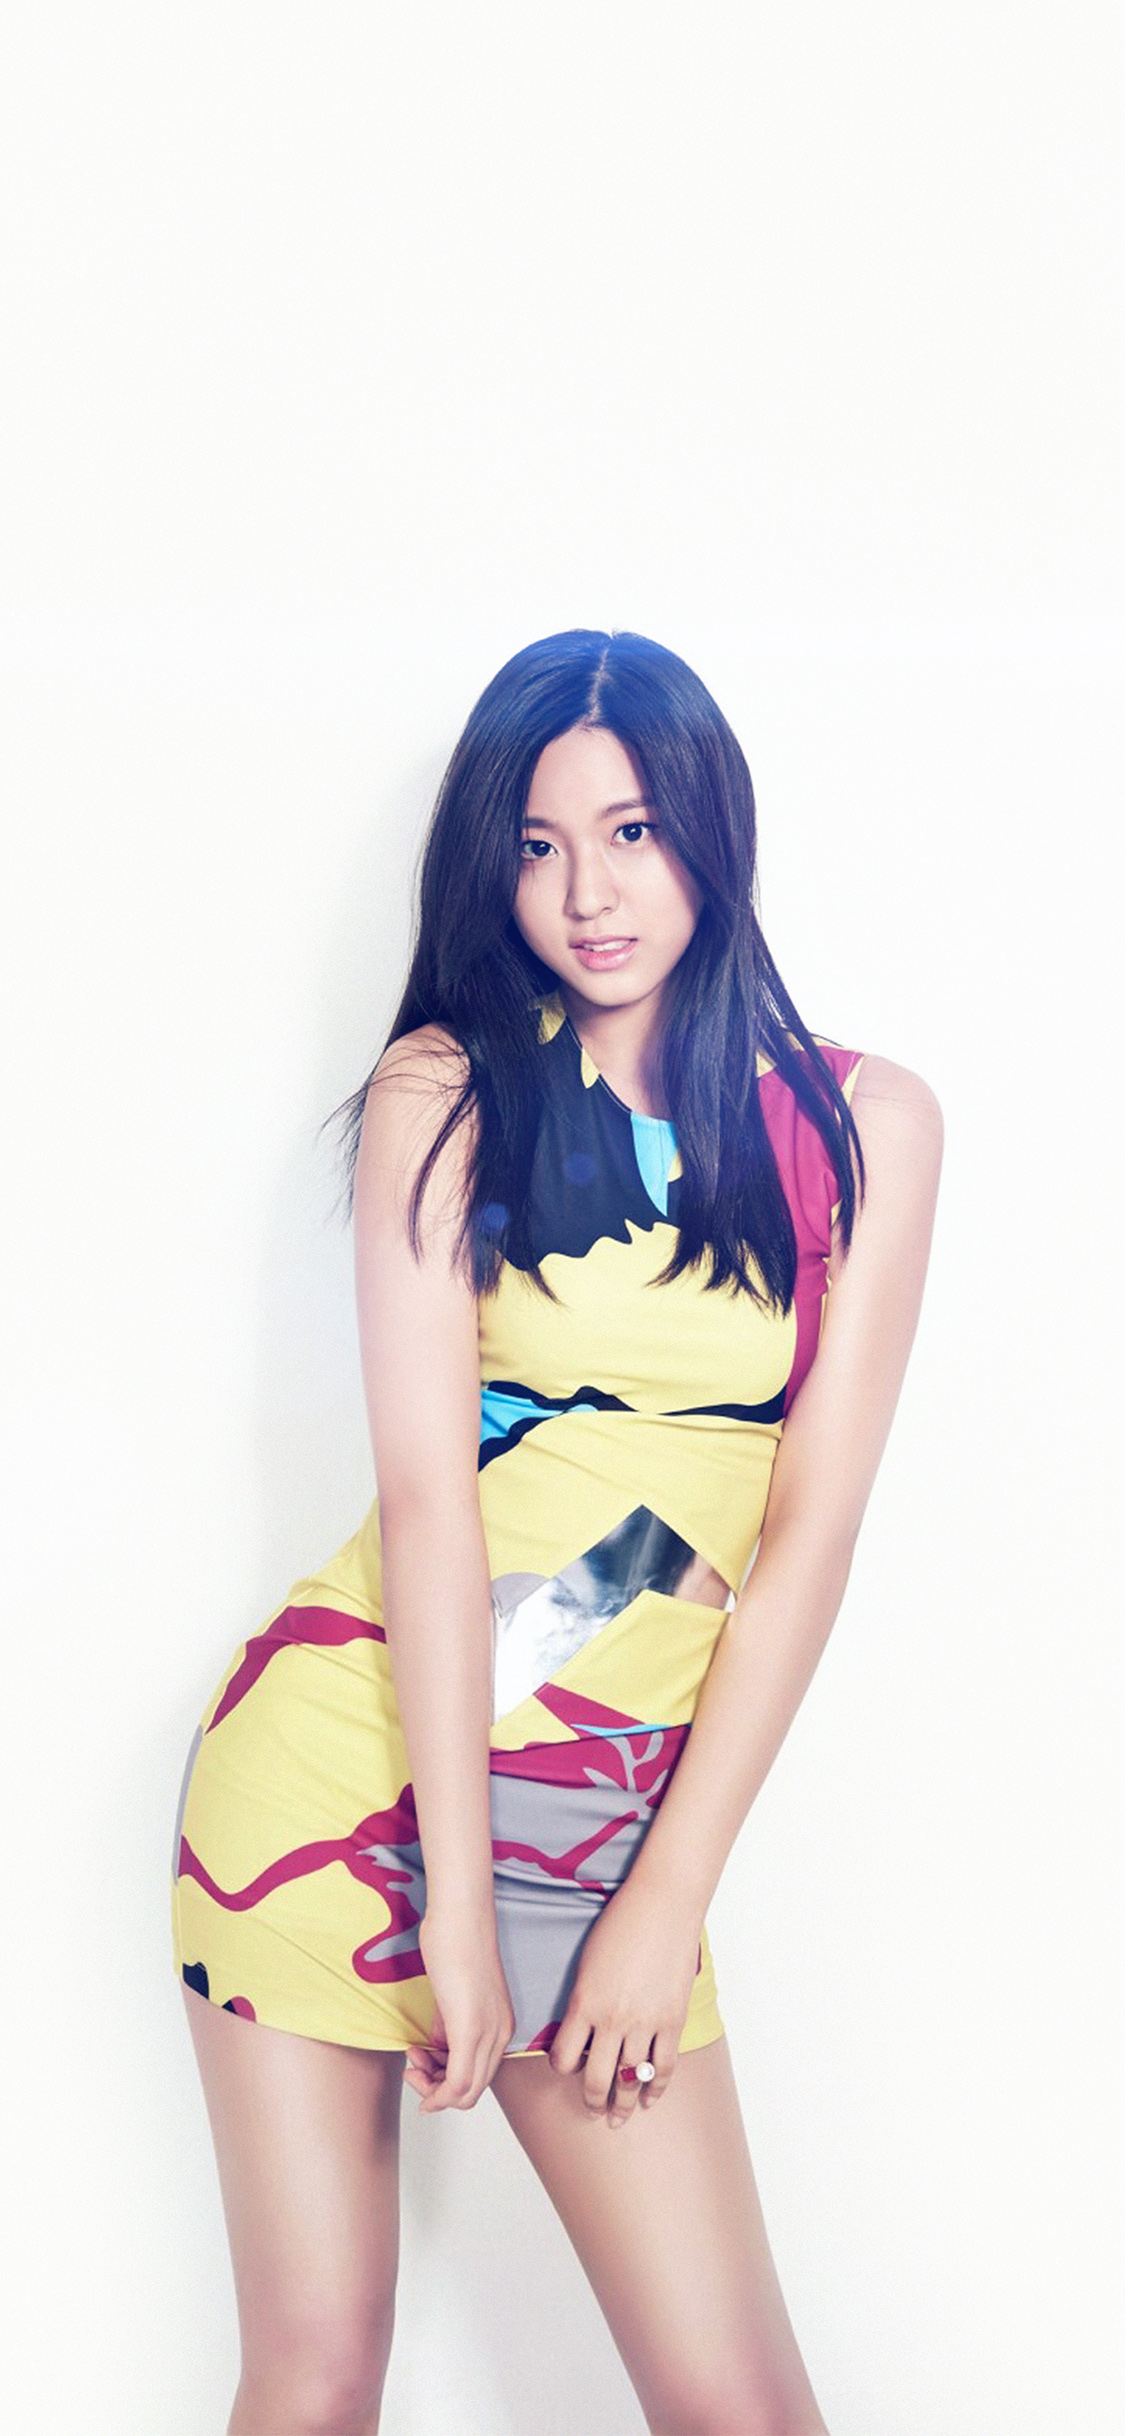 iPhoneXpapers.com-Apple-iPhone-wallpaper-hh23-seolhyun-aoa-kpop-love-cute-white-flare